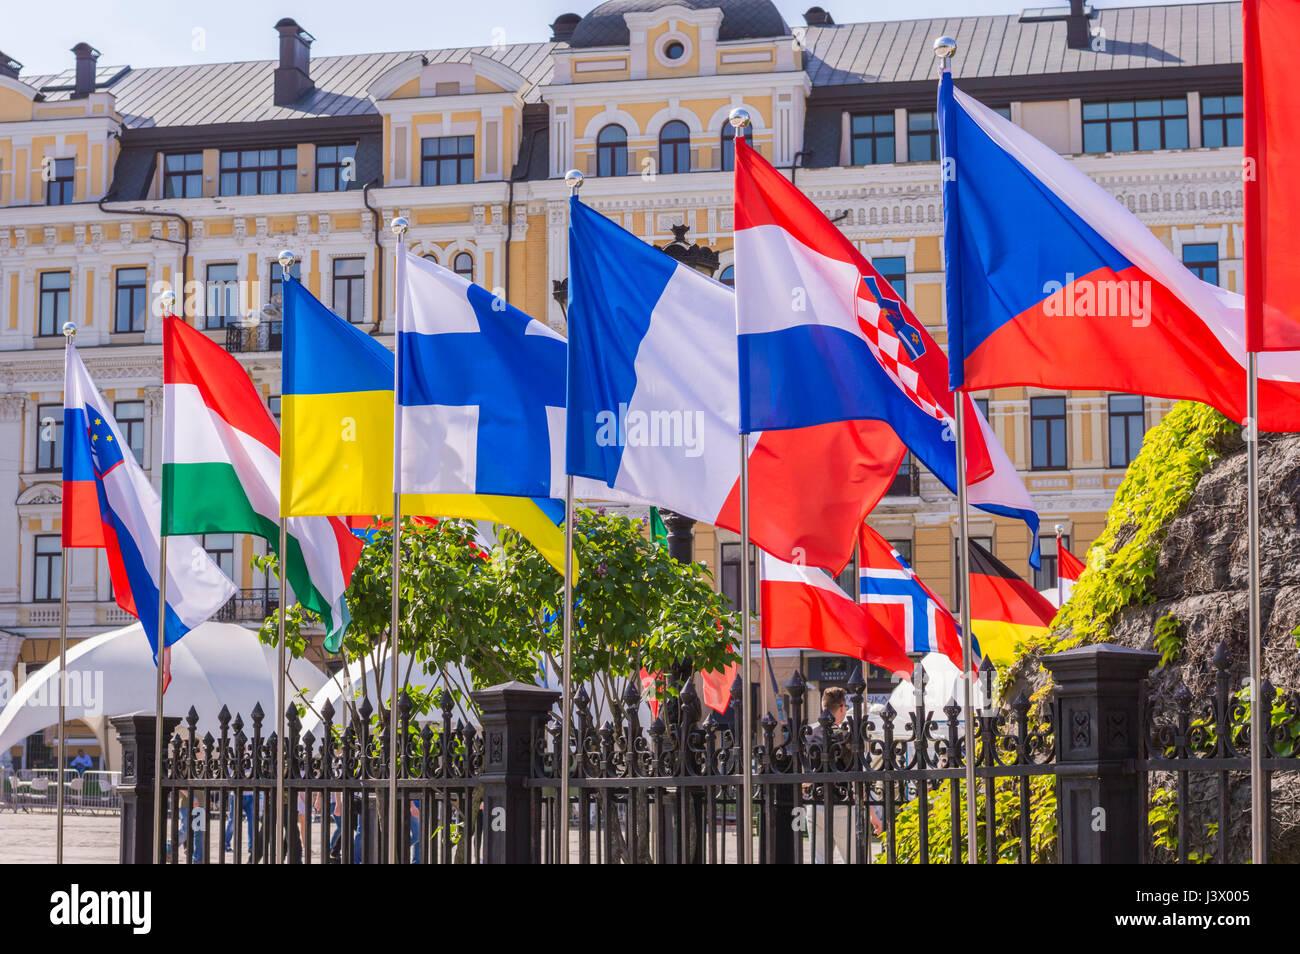 KIEV, UKRAINE - MAY 7, 2017: flags of European countries in Eurovision fan zone in Kiev, Ukraine, 2017 Credit: Denys - Stock Image